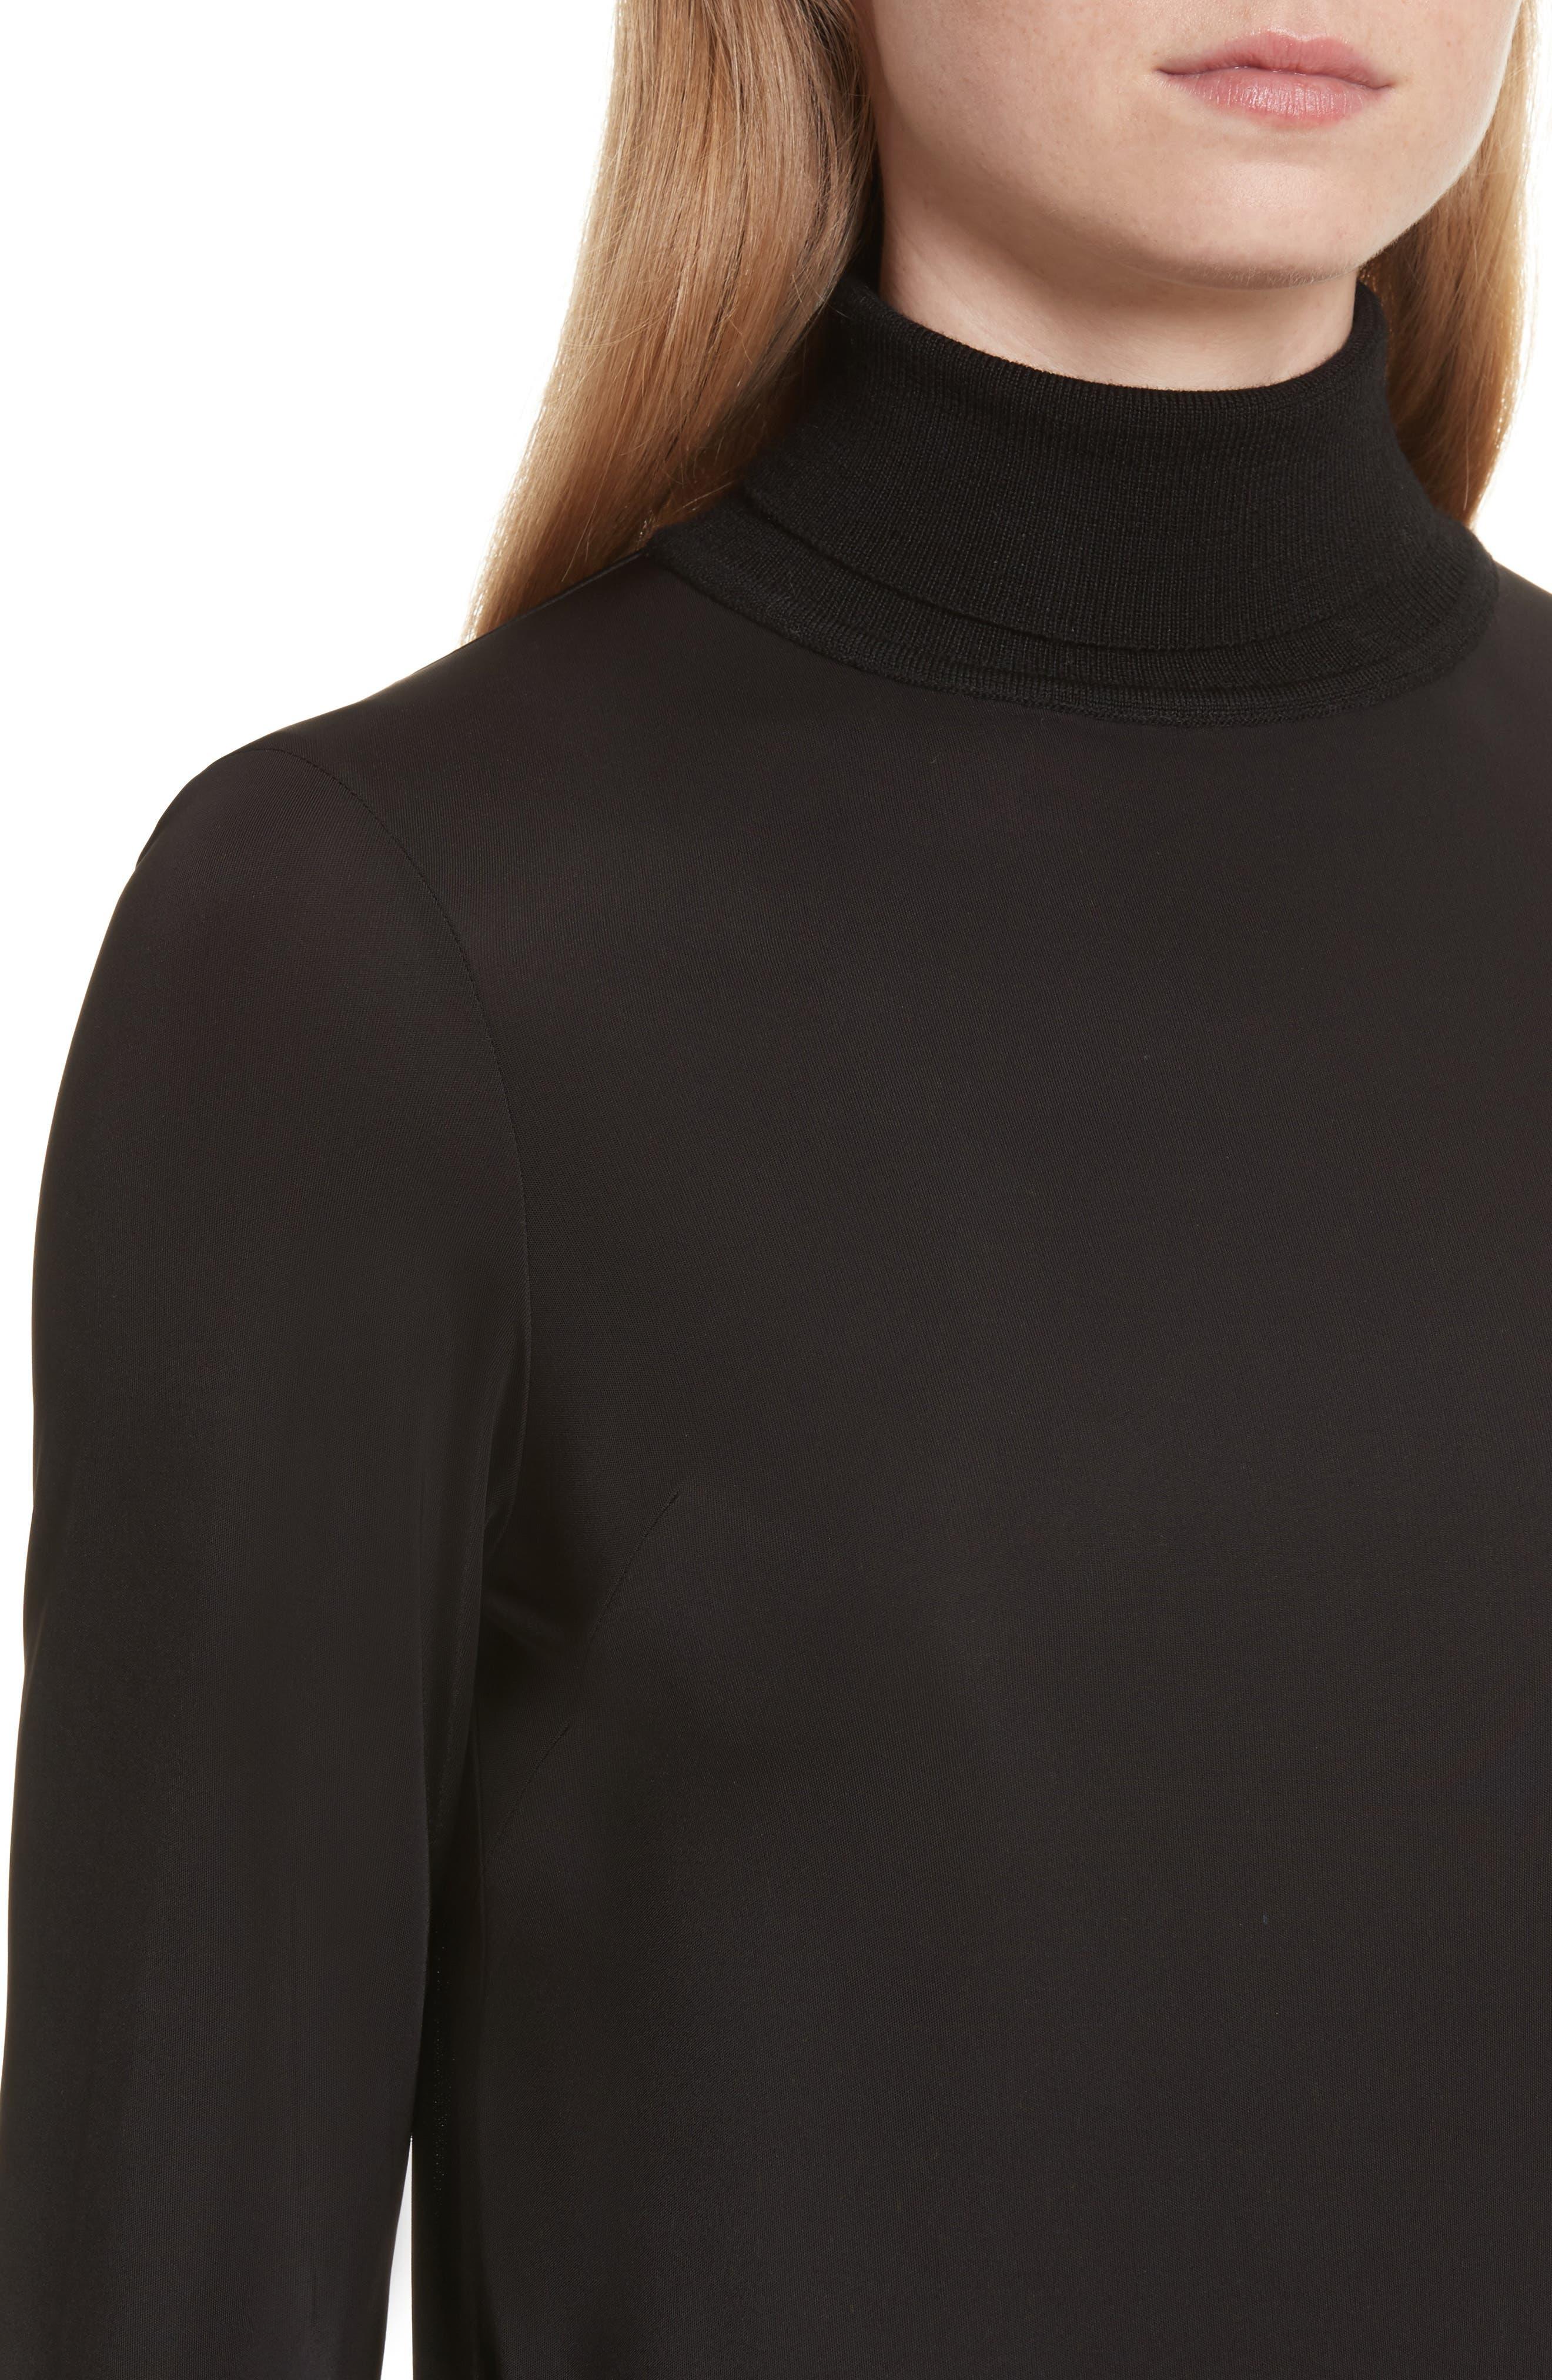 Merino Trim Turtleneck Sweater,                             Alternate thumbnail 4, color,                             Black